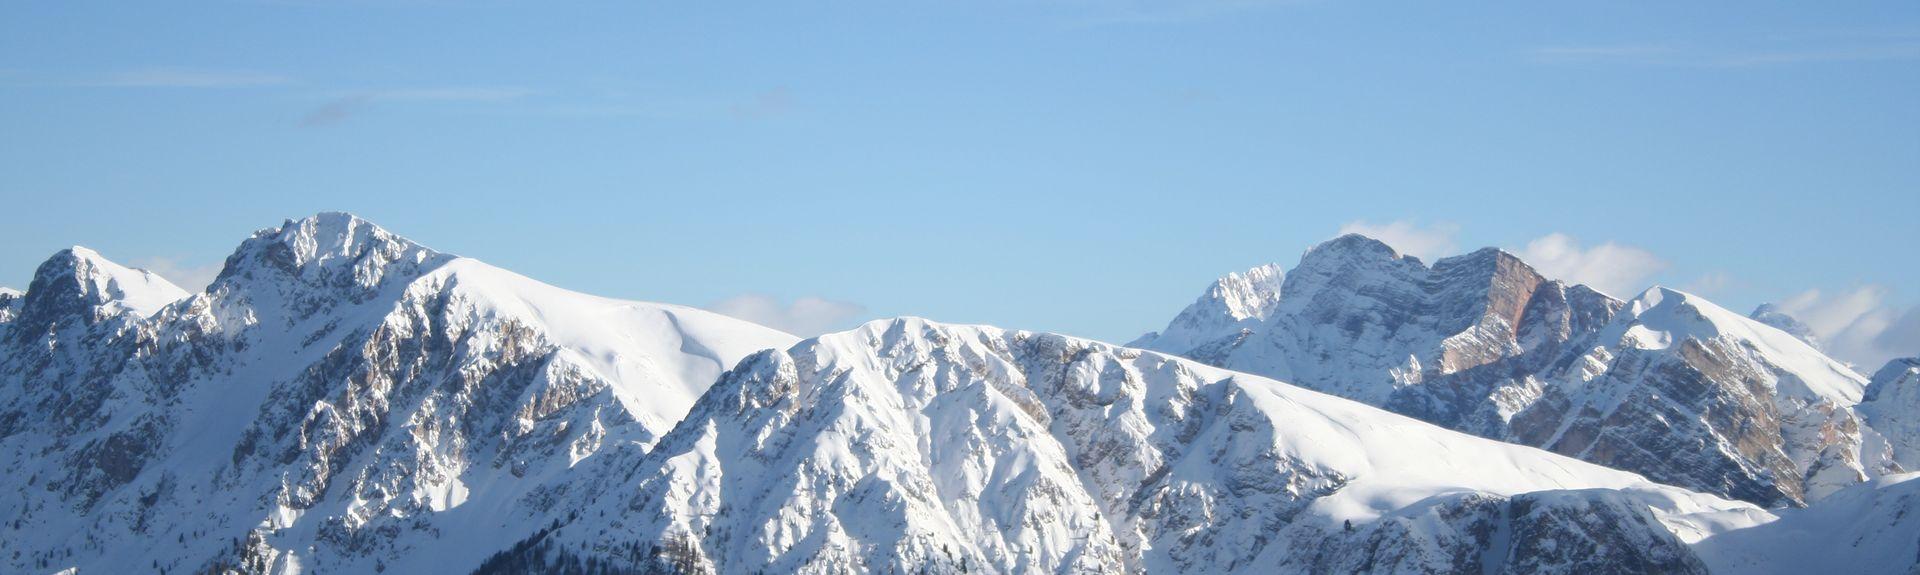 Riscone, Alto Adige, Trentino-Alto Adige/South Tyrol, Italy